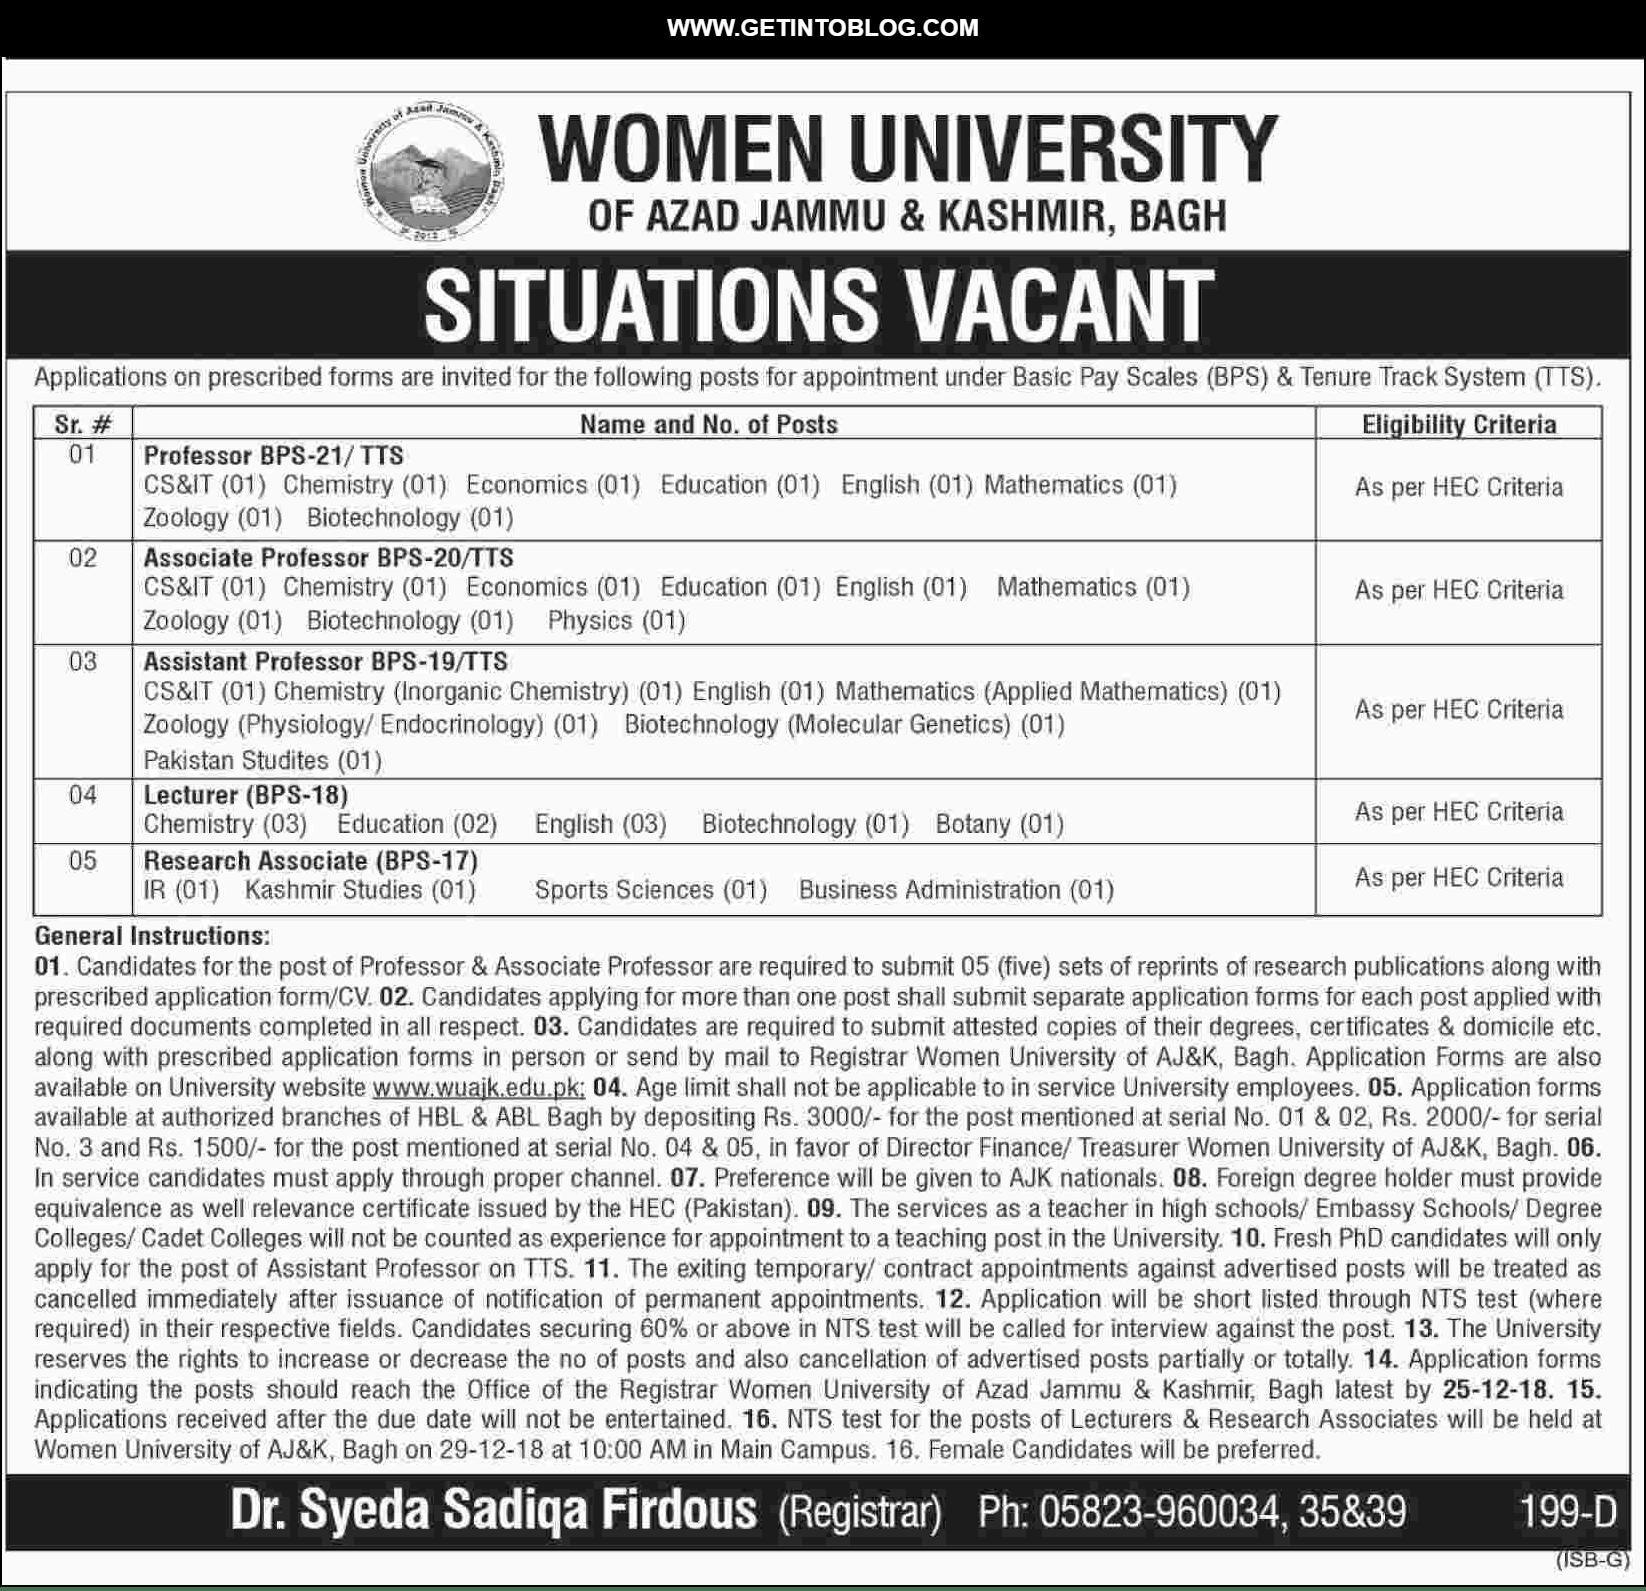 Bagh AJK University Jobs 2018 13 December Job, Jobs in